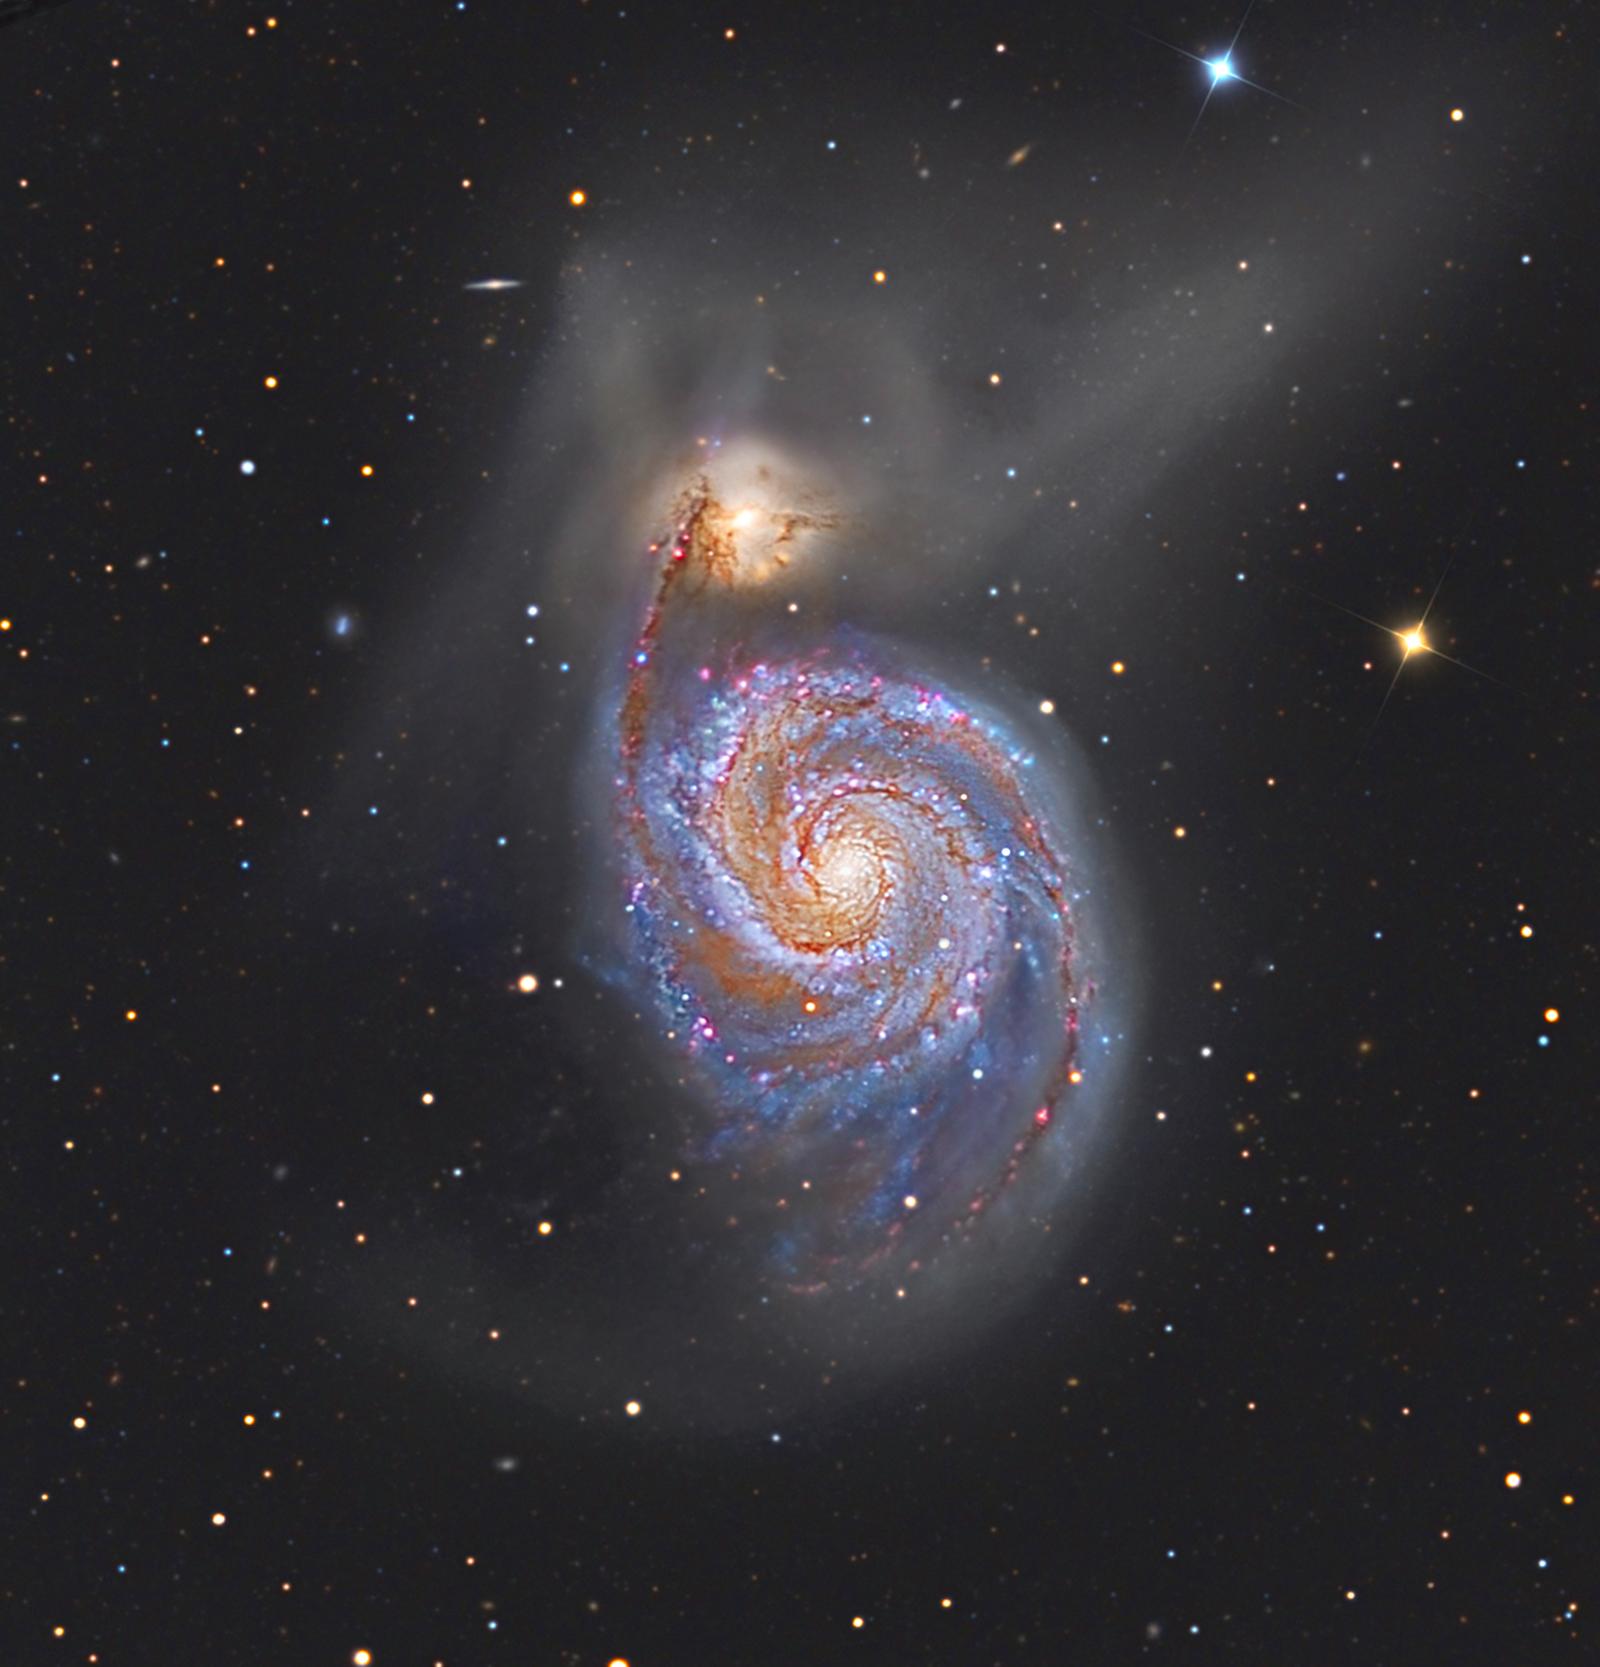 nasa whirlpool galaxy - photo #4